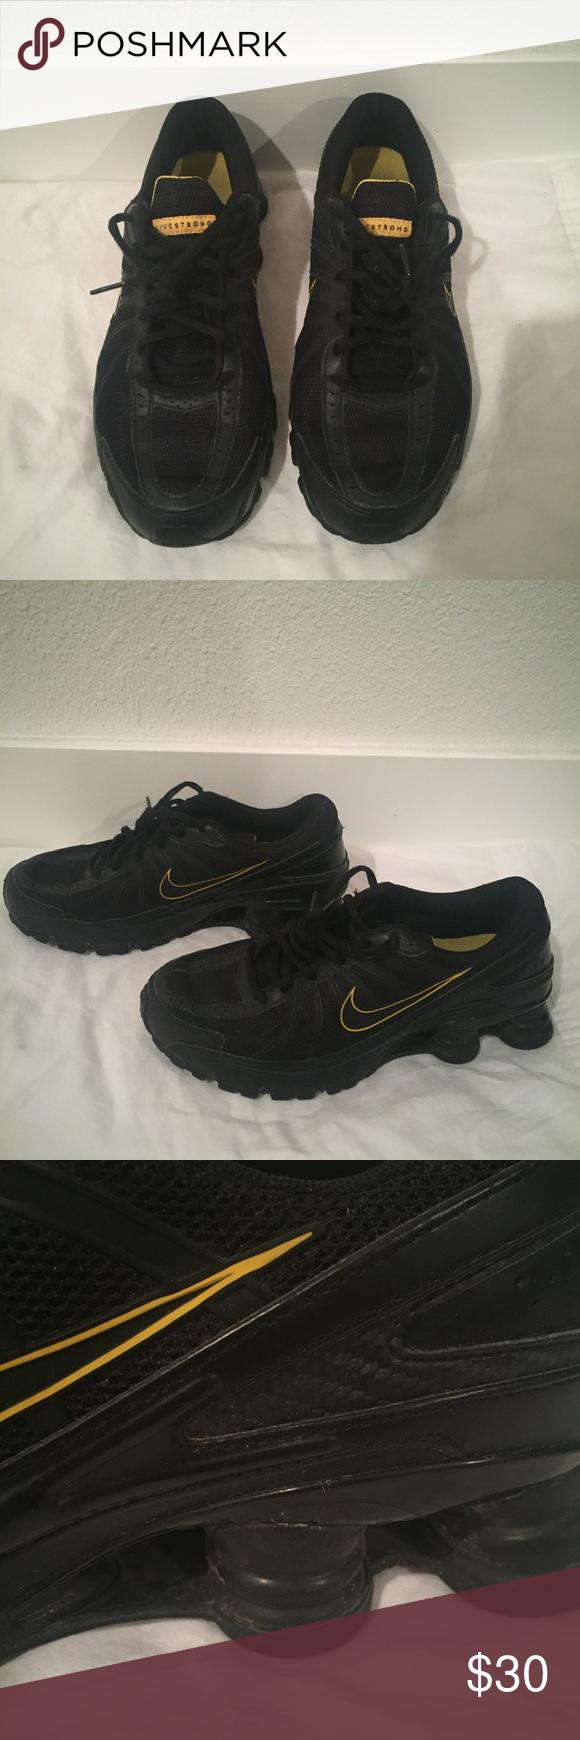 970ffec52c15 NIKE Shox Sneakers (Men s) Black with yellow pops